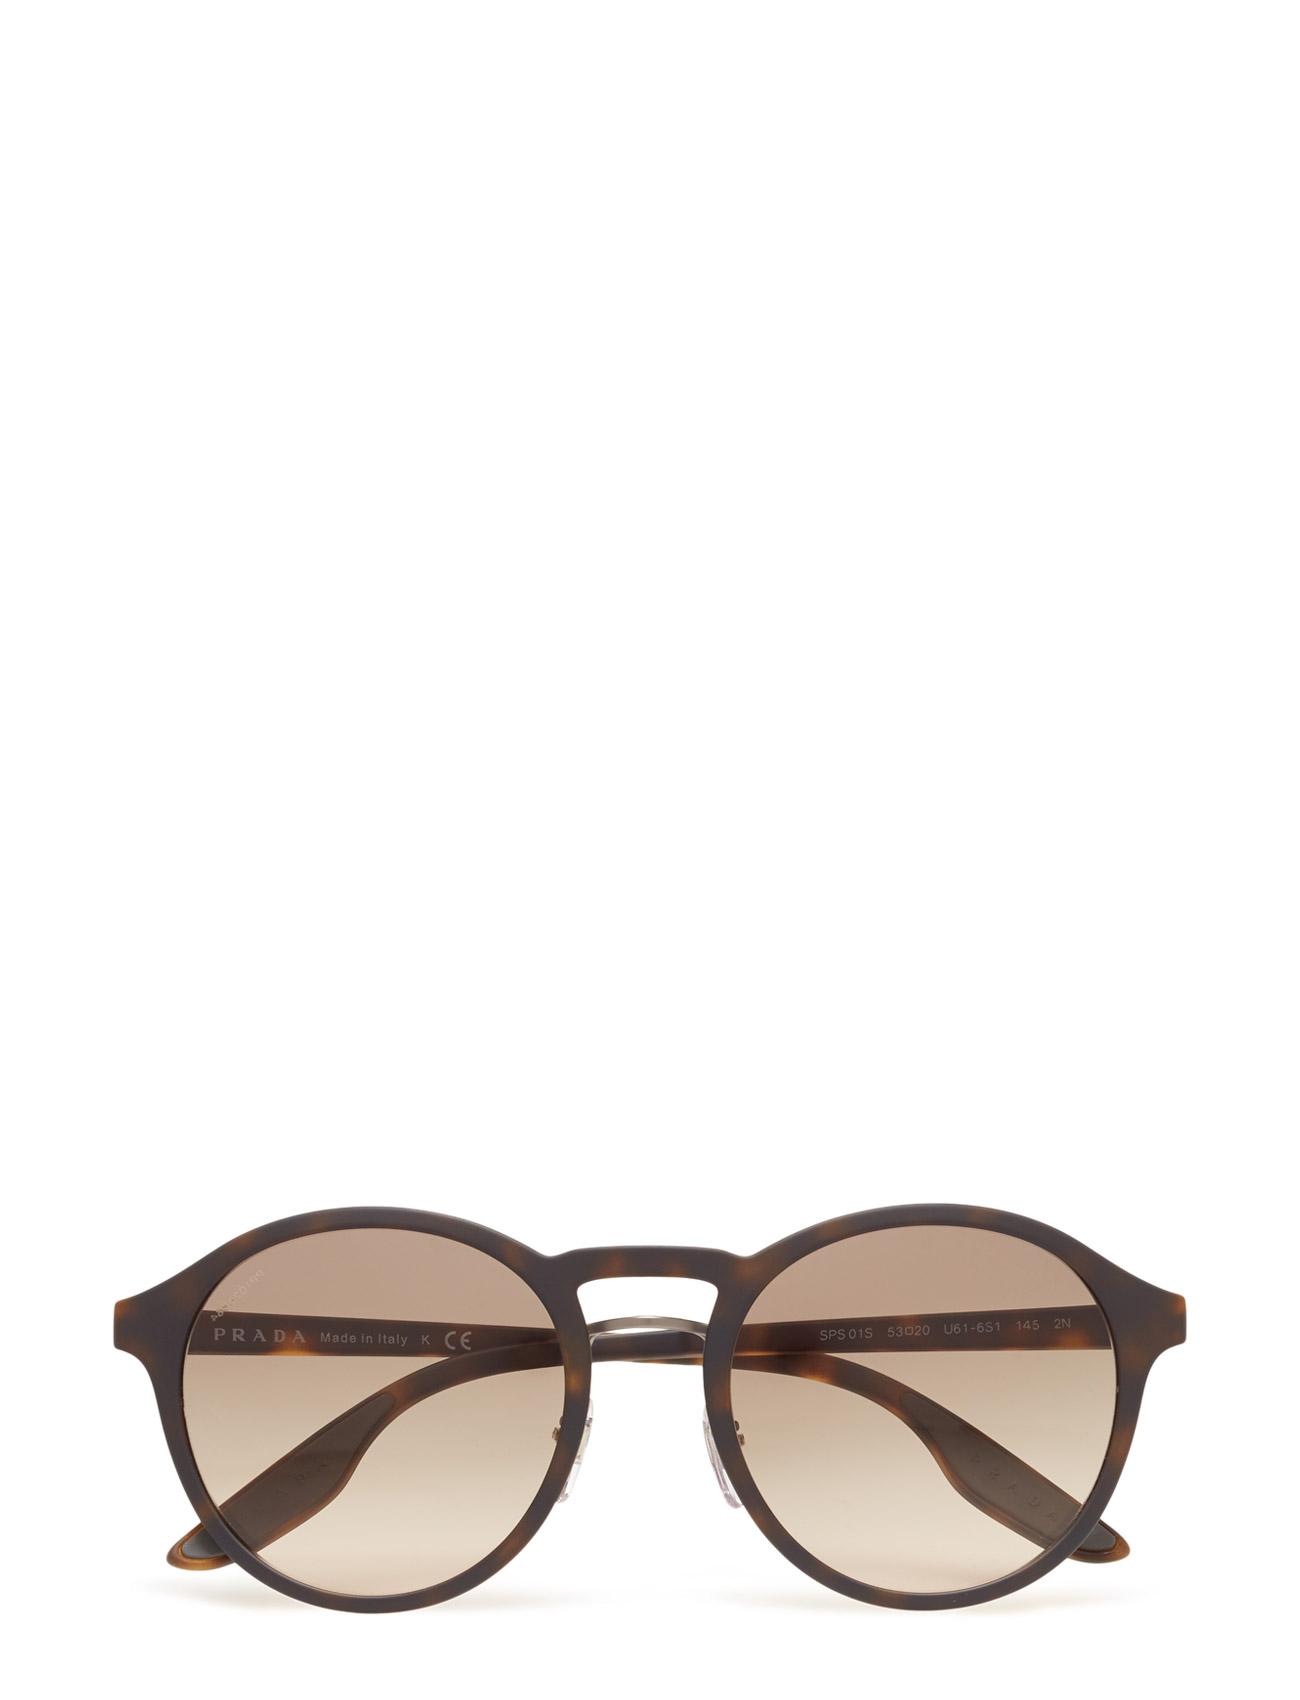 D-Frame Prada Sport Sunglasses Solbriller til Herrer i